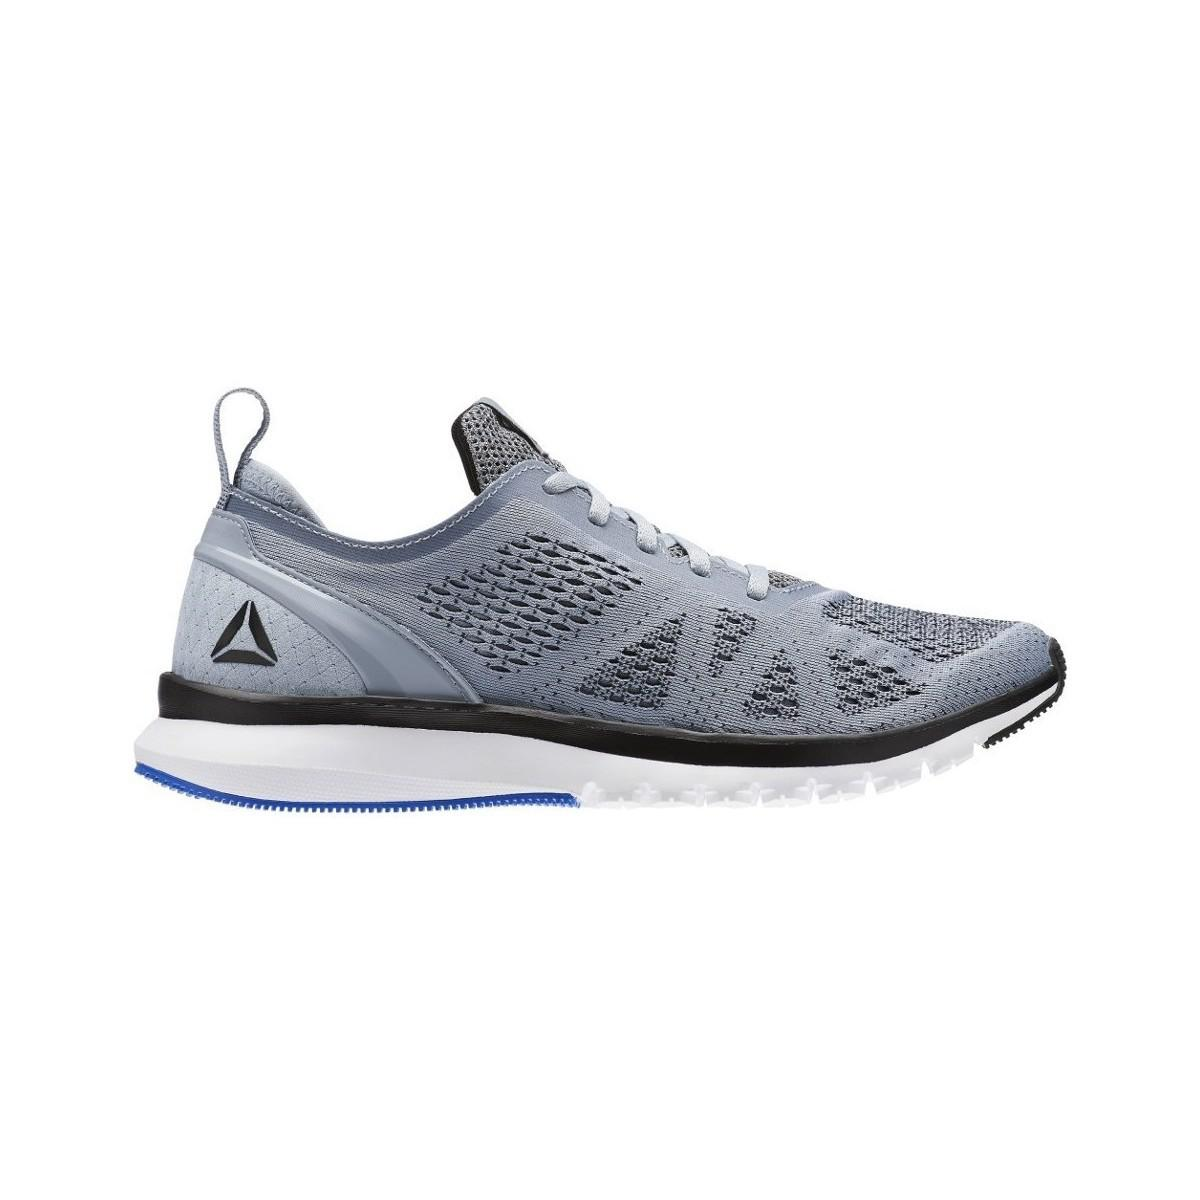 Reebok Print Smooth Clip U Greyblkwhtbluepw Men s Shoes (trainers ... 6a90ff4f5